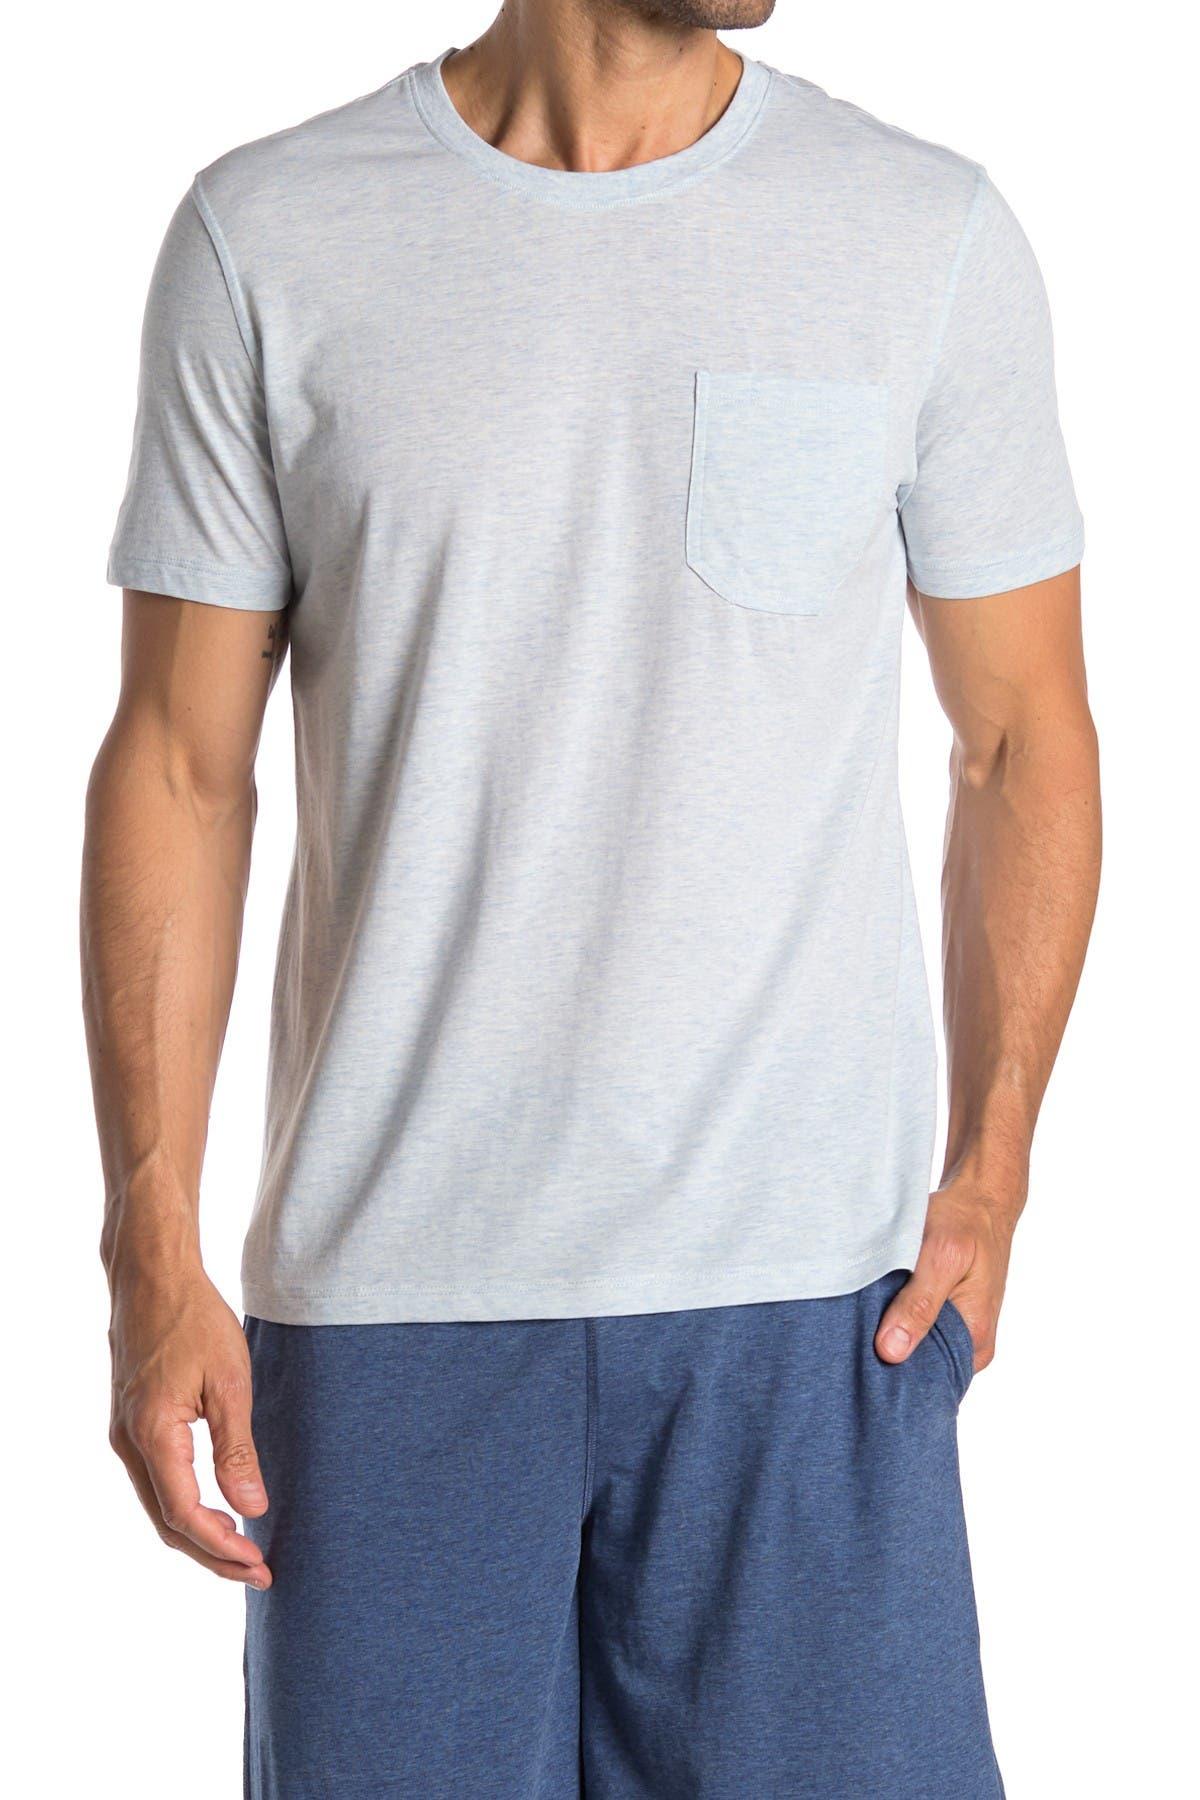 Image of Daniel Buchler Crew Neck Pocket T-Shirt